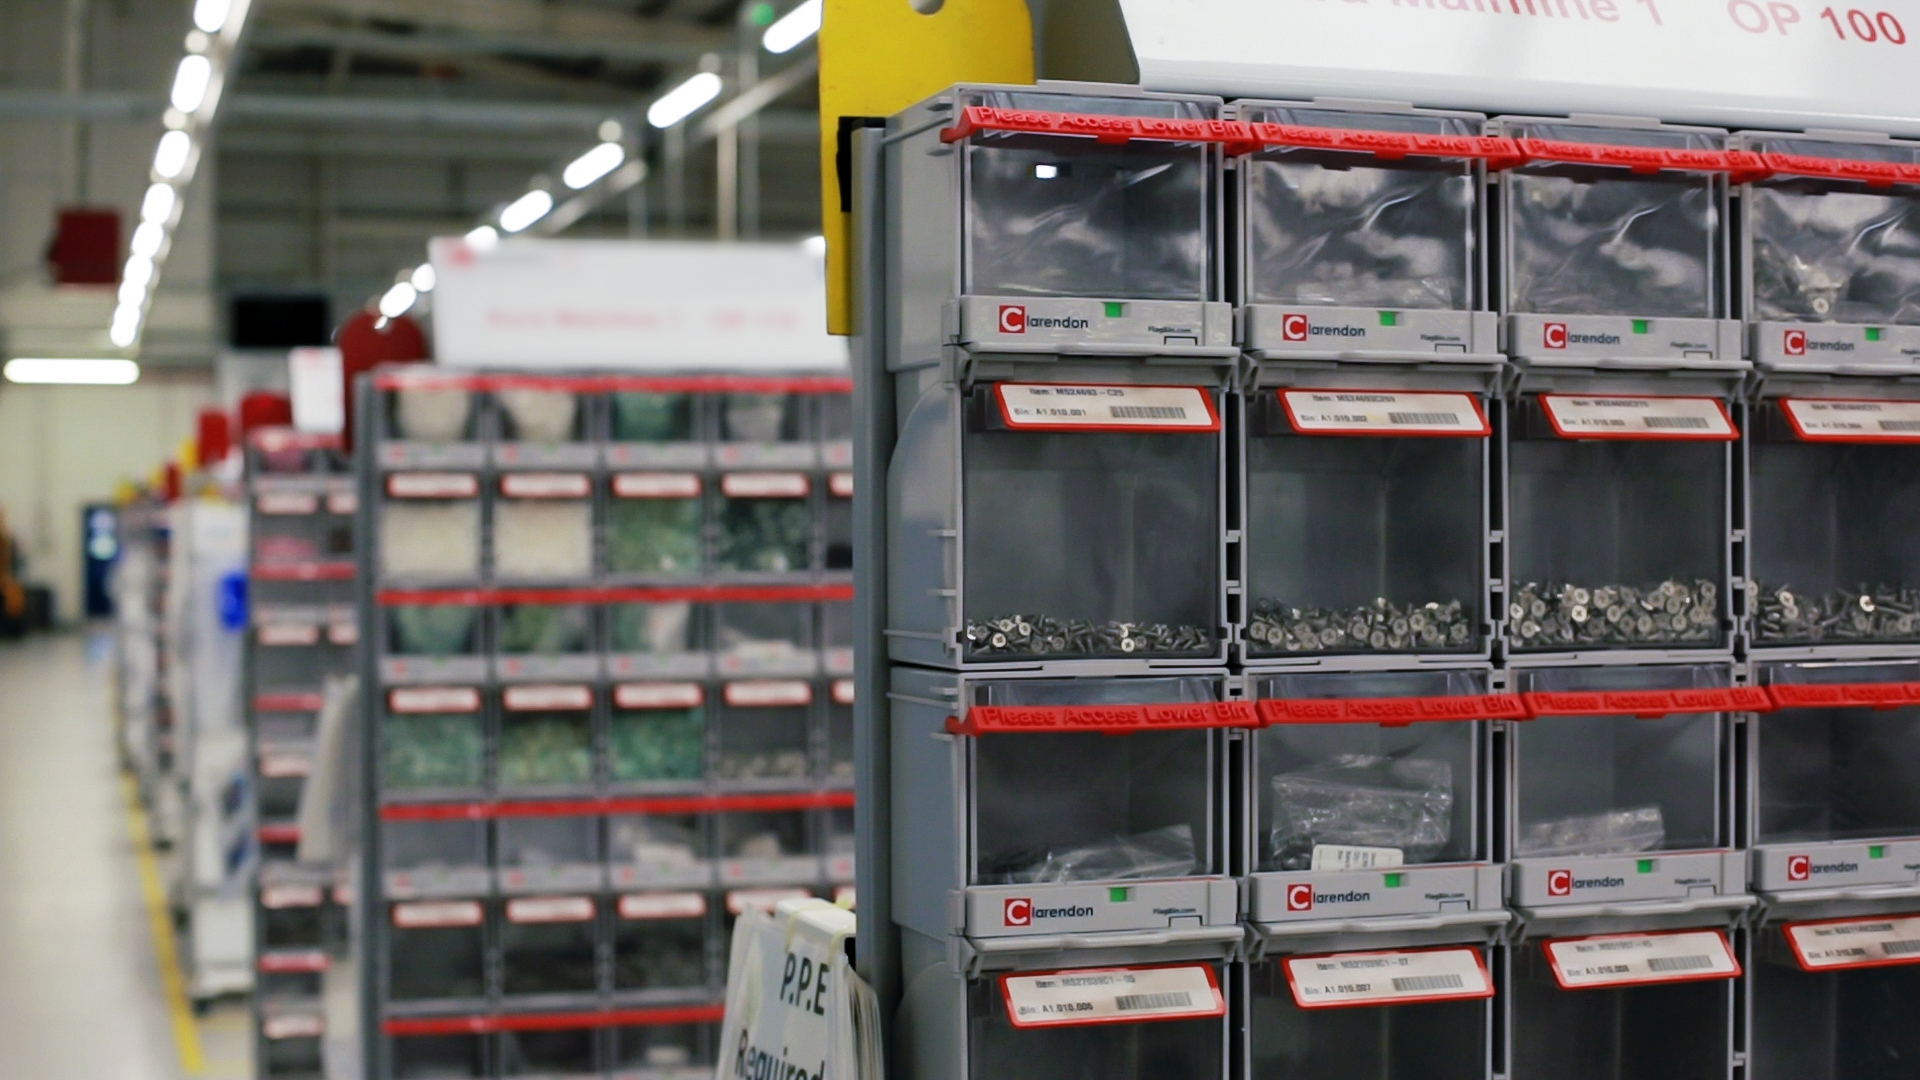 Automatic Inventory Replenishment Rfid Twin Bin System